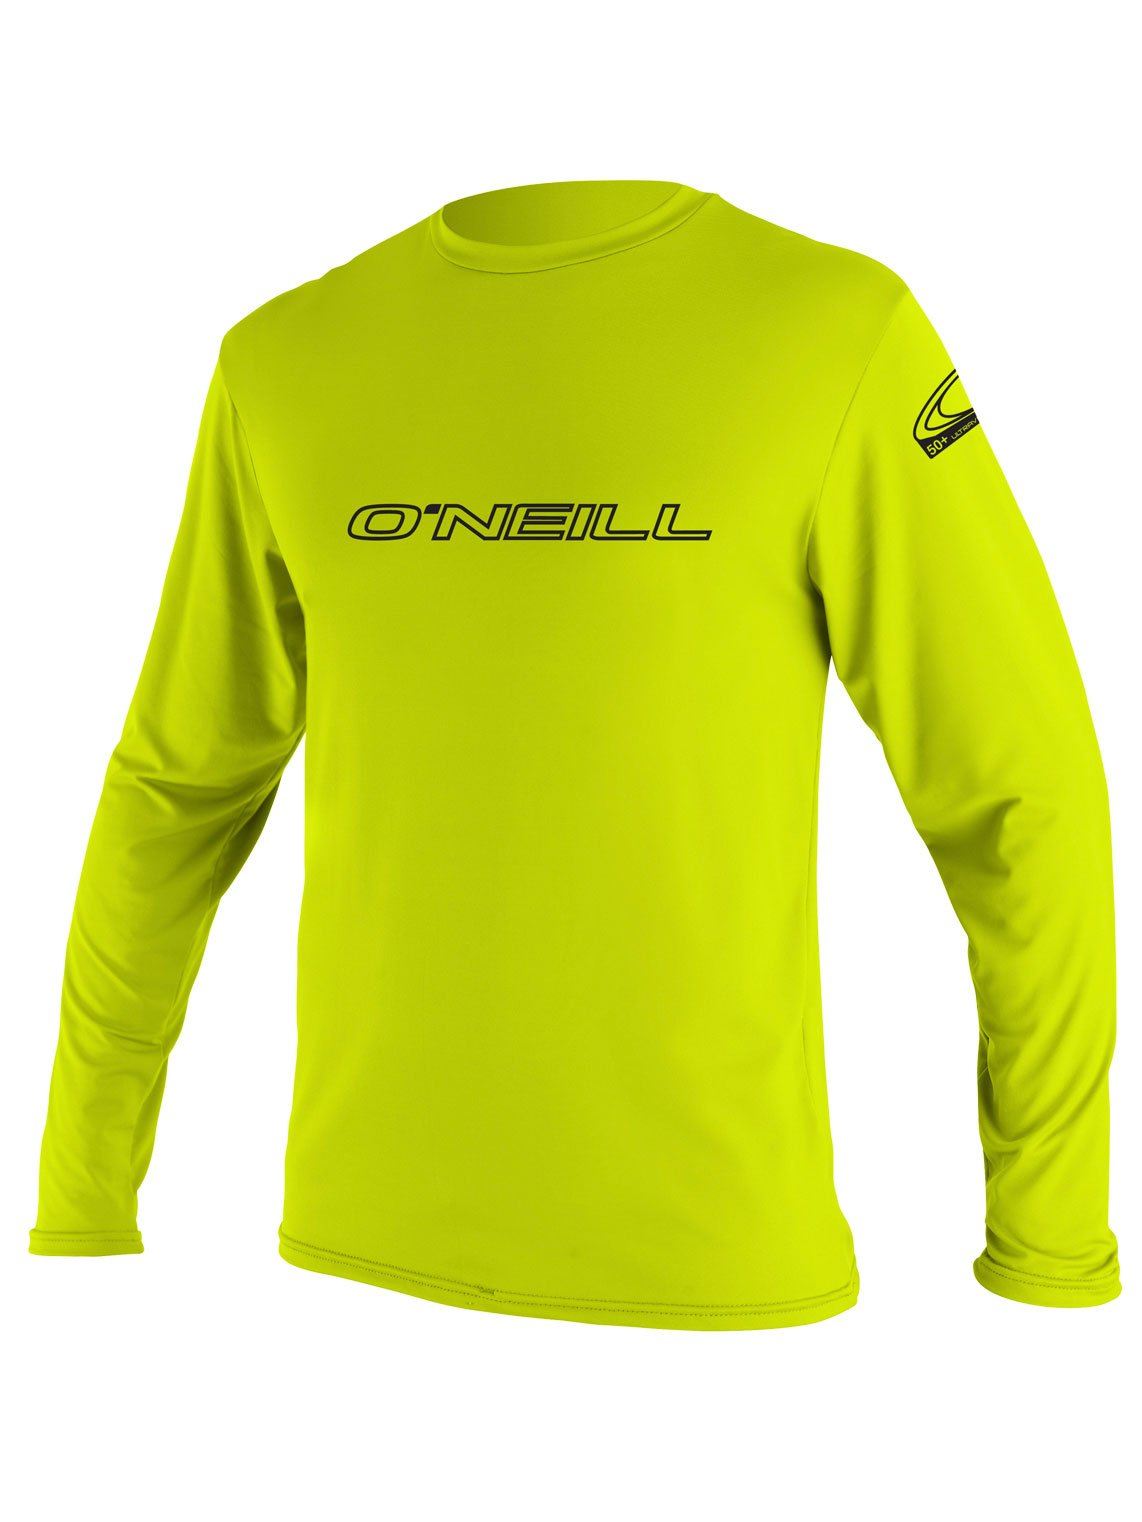 O'Neill Youth Basic Skins UPF 50+ Long Sleeve Sun Shirt, Lime, 6